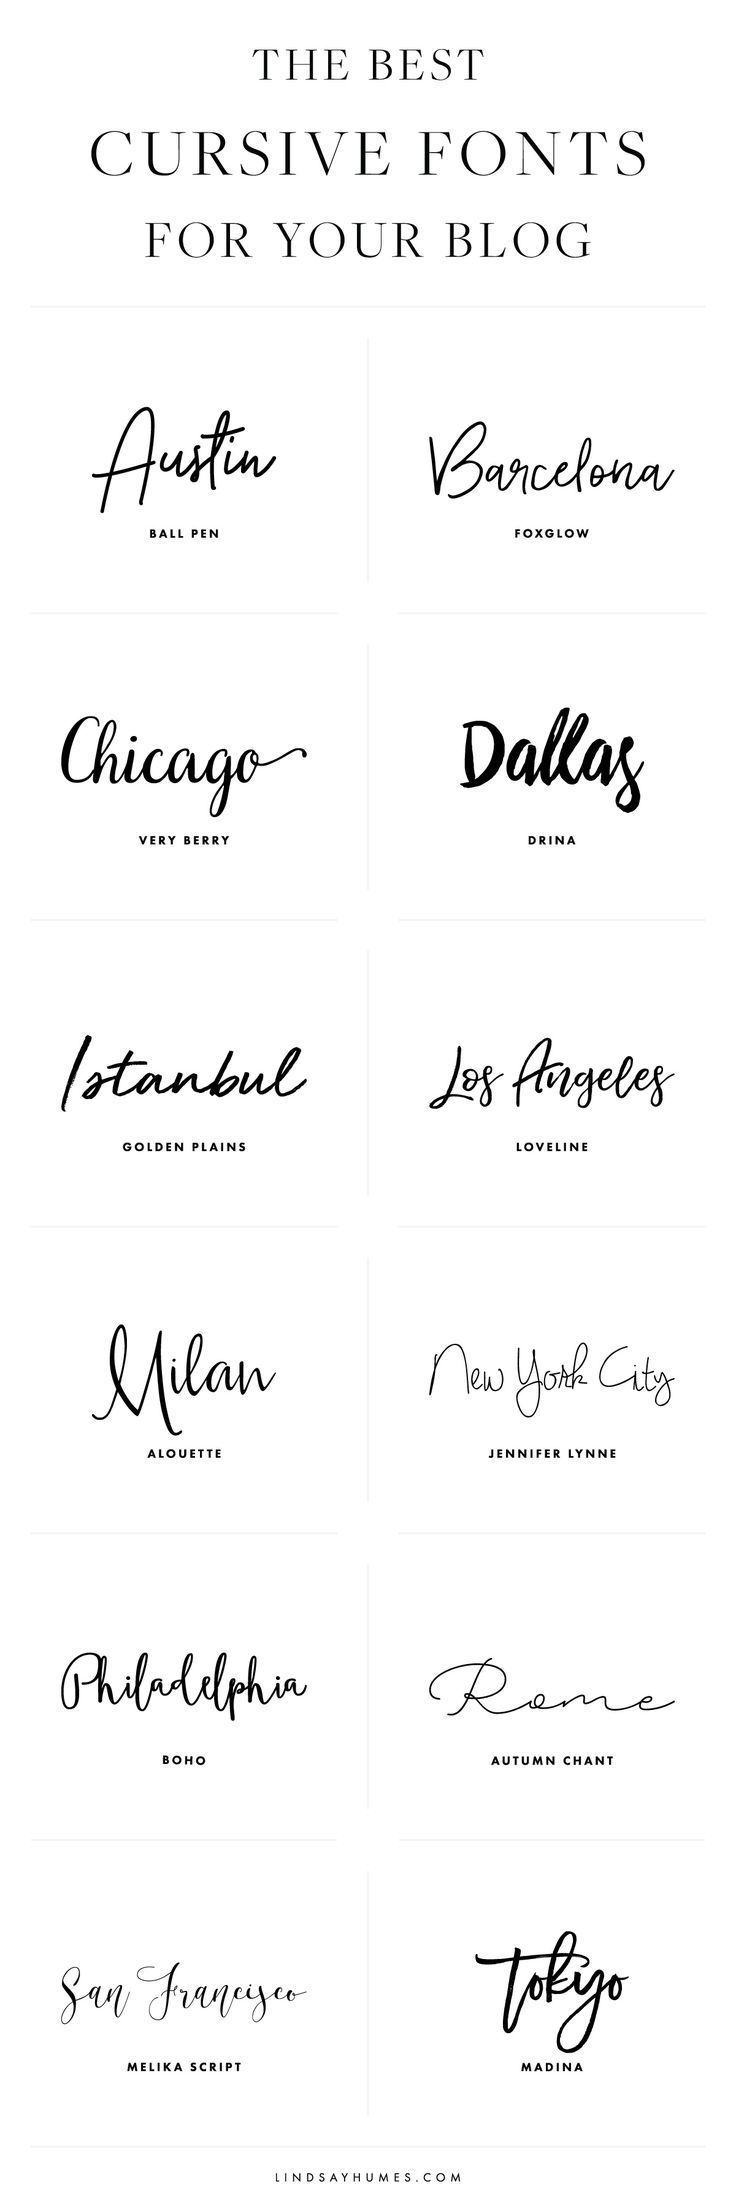 The Best Cursive Fonts for Your Blog Design #Weddingsquotes